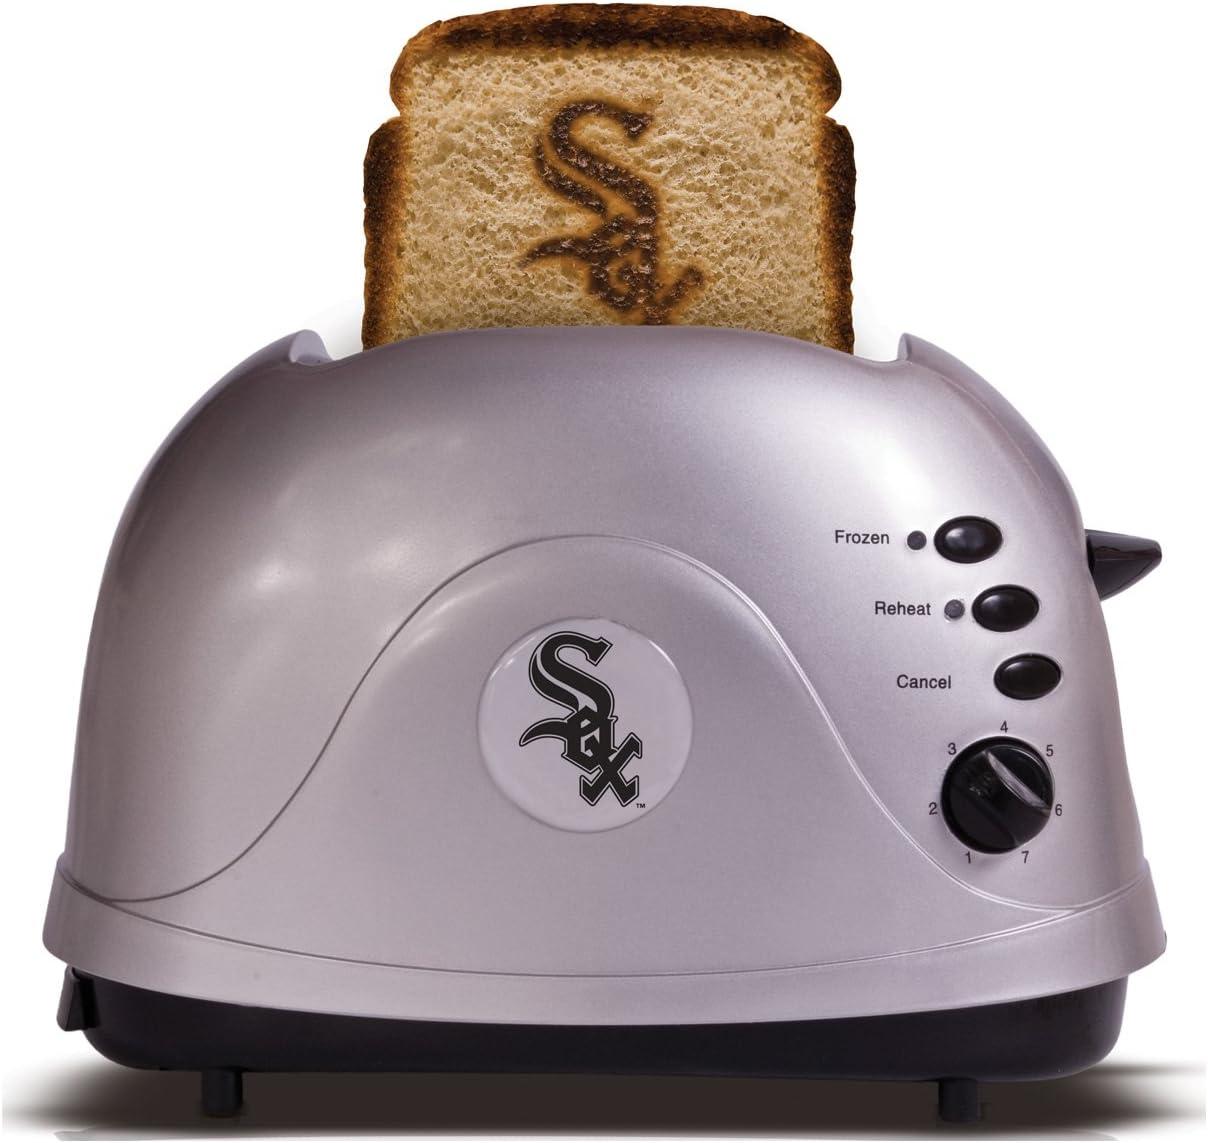 MLB Chicago White Tulsa Mall Sox Toaster Logo Team Dealing full price reduction Protoast